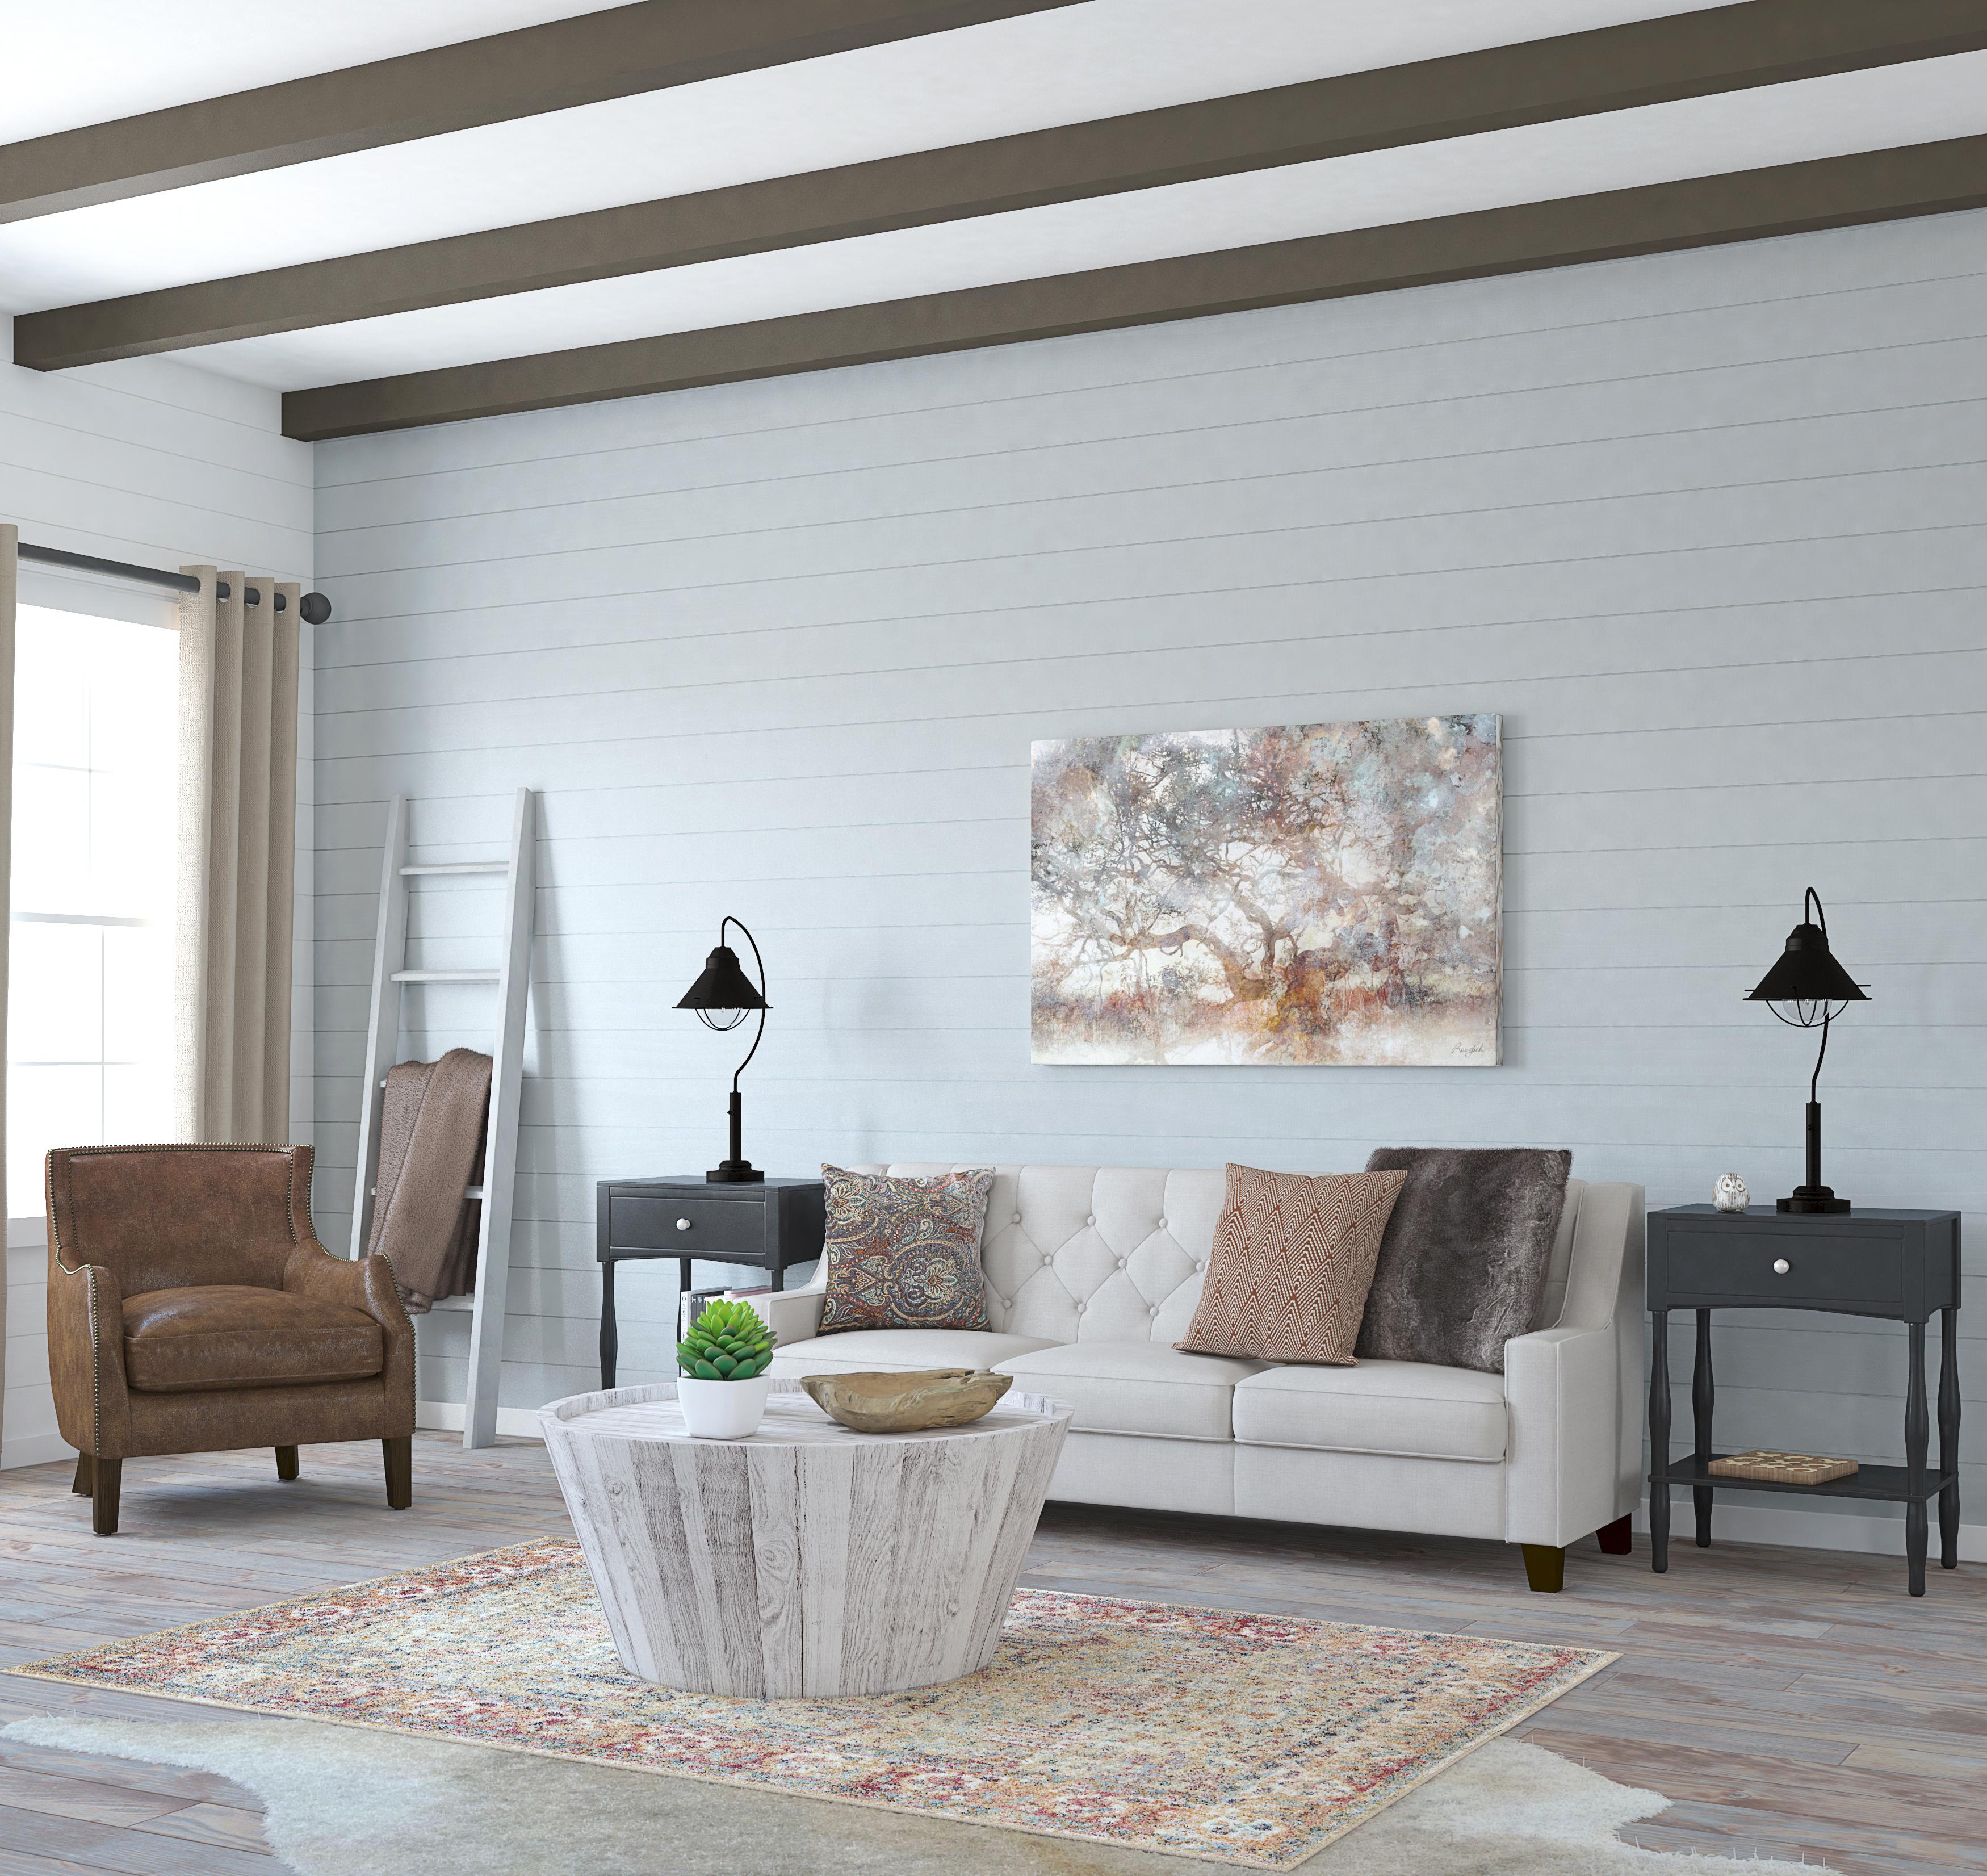 Overstock.com Introduces 17 Exclusive Private Label Furniture Brands  Nasdaq:OSTK